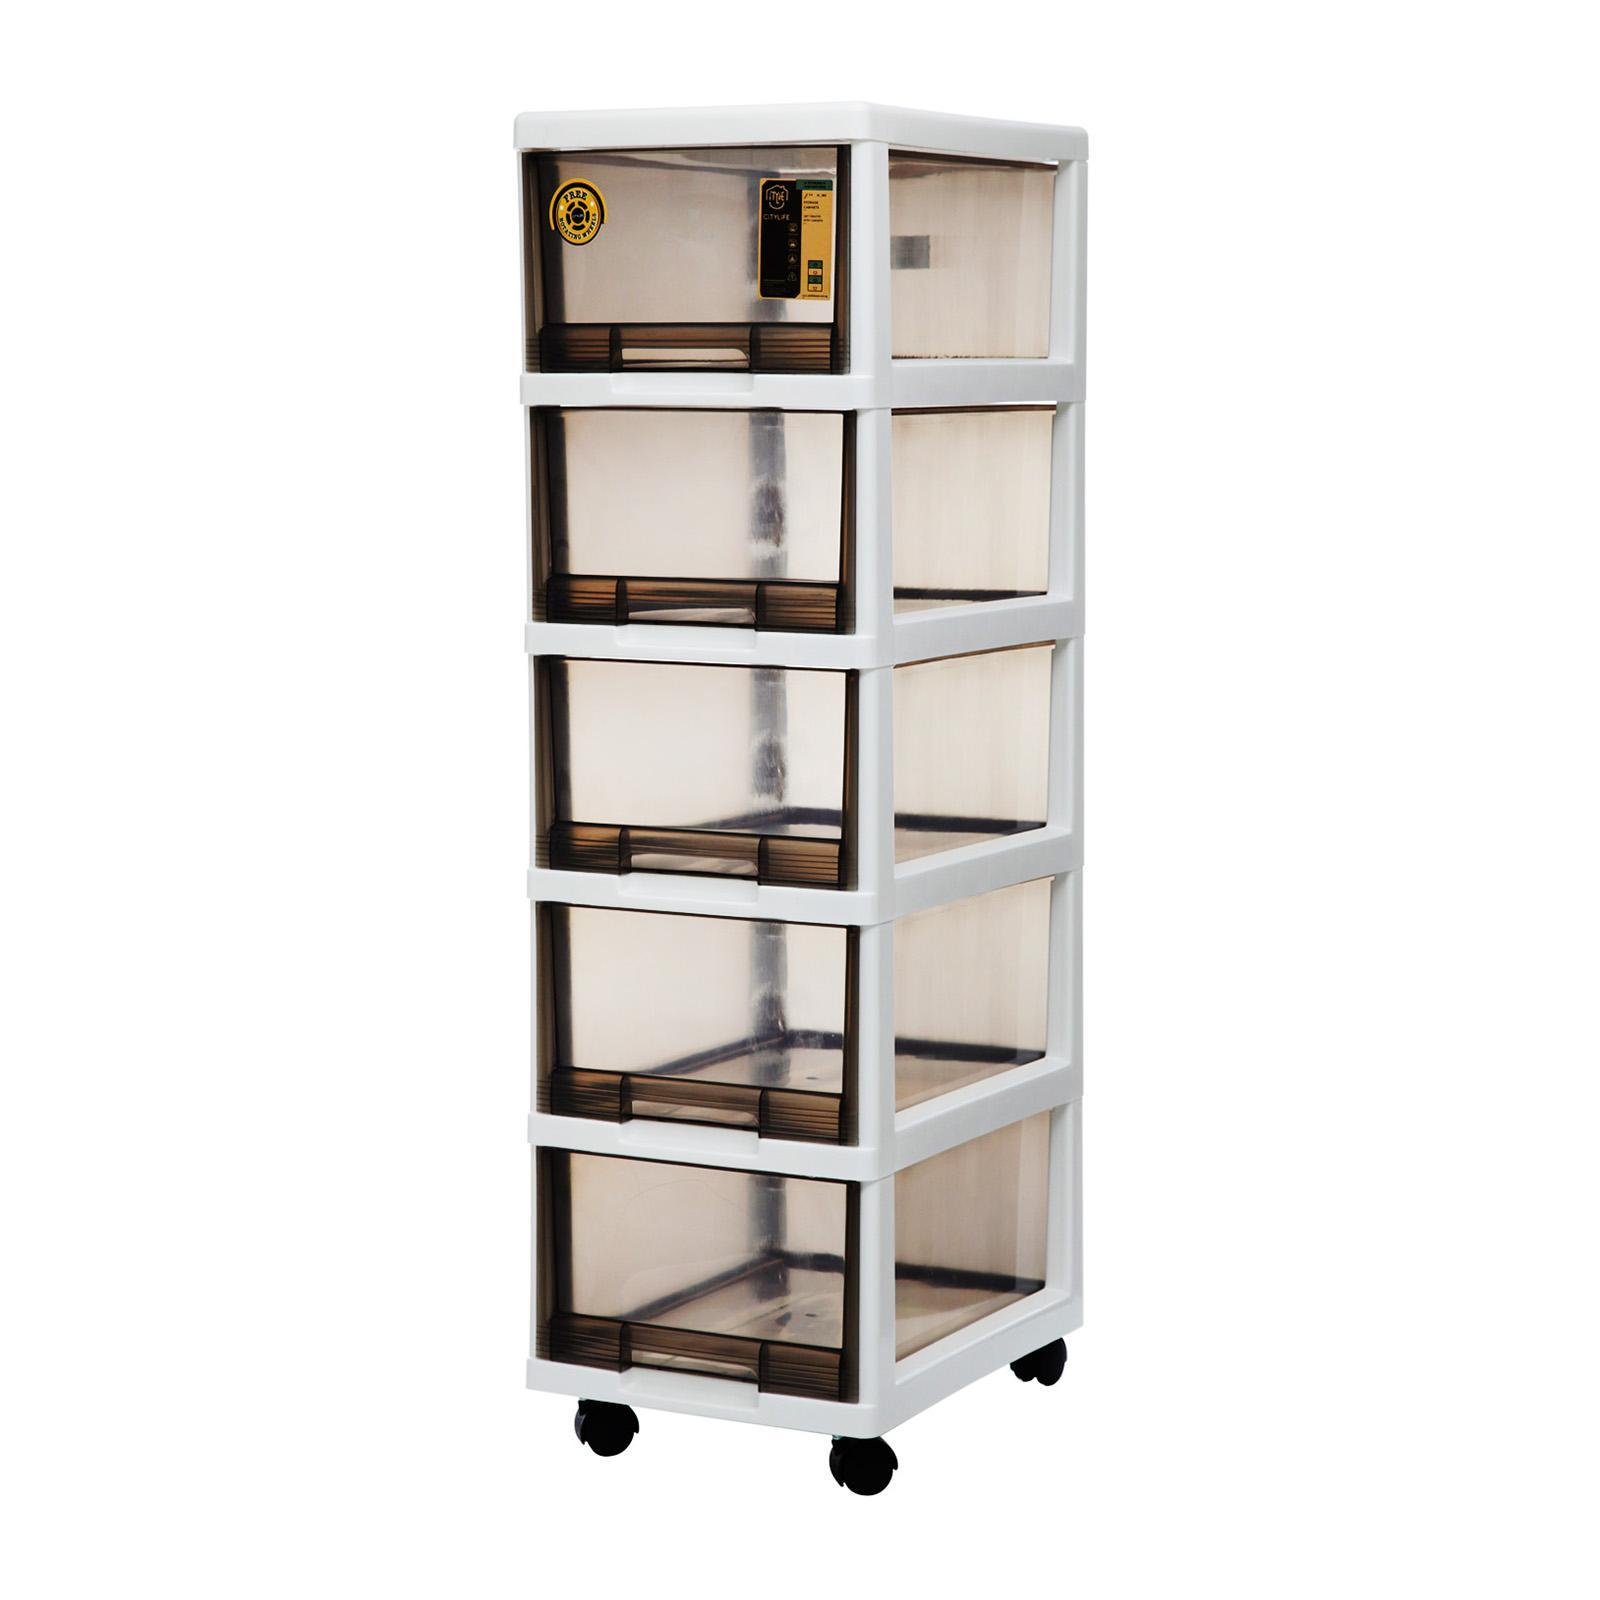 CITYLIFE 5 Tier Storage Cabinet With Wheels